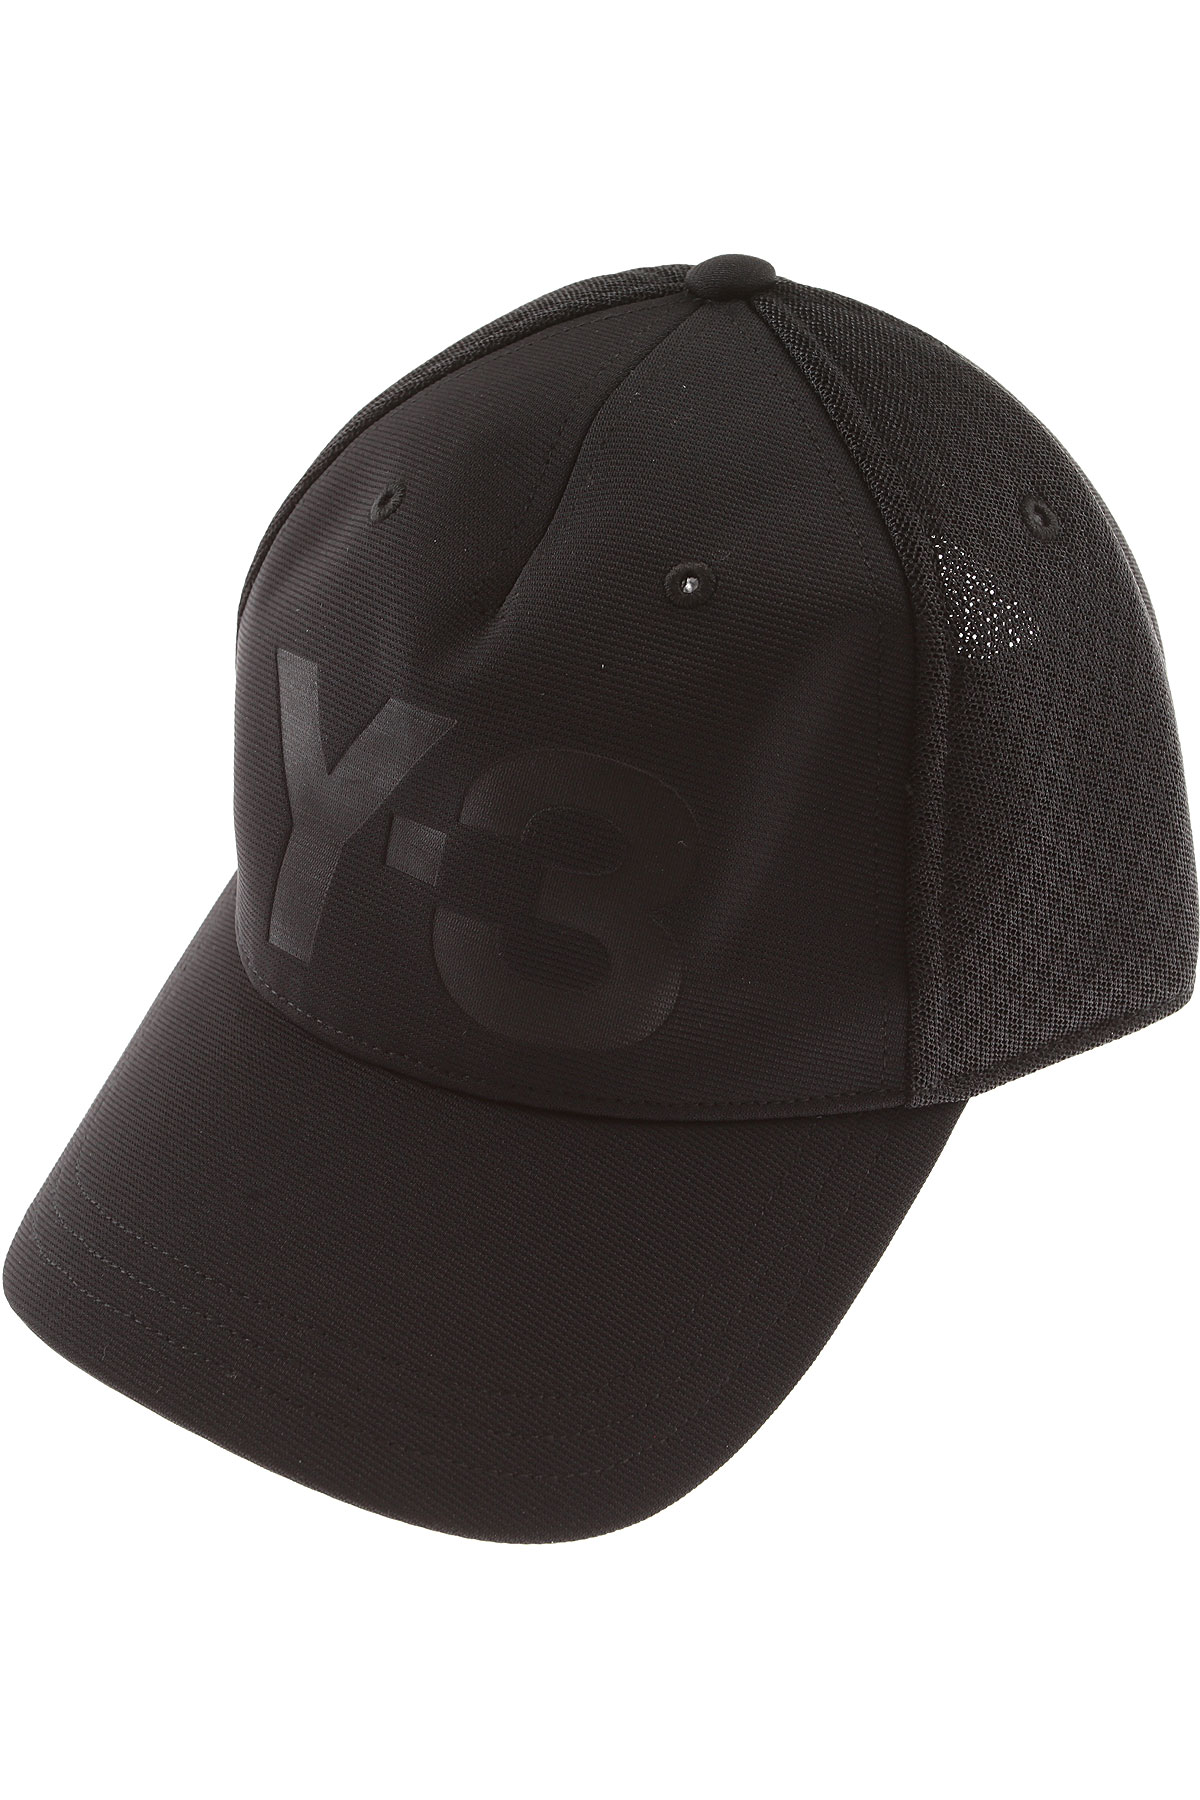 Image of Adidas Hat for Women, Yohji Yamamoto, Black, polyester, 2017